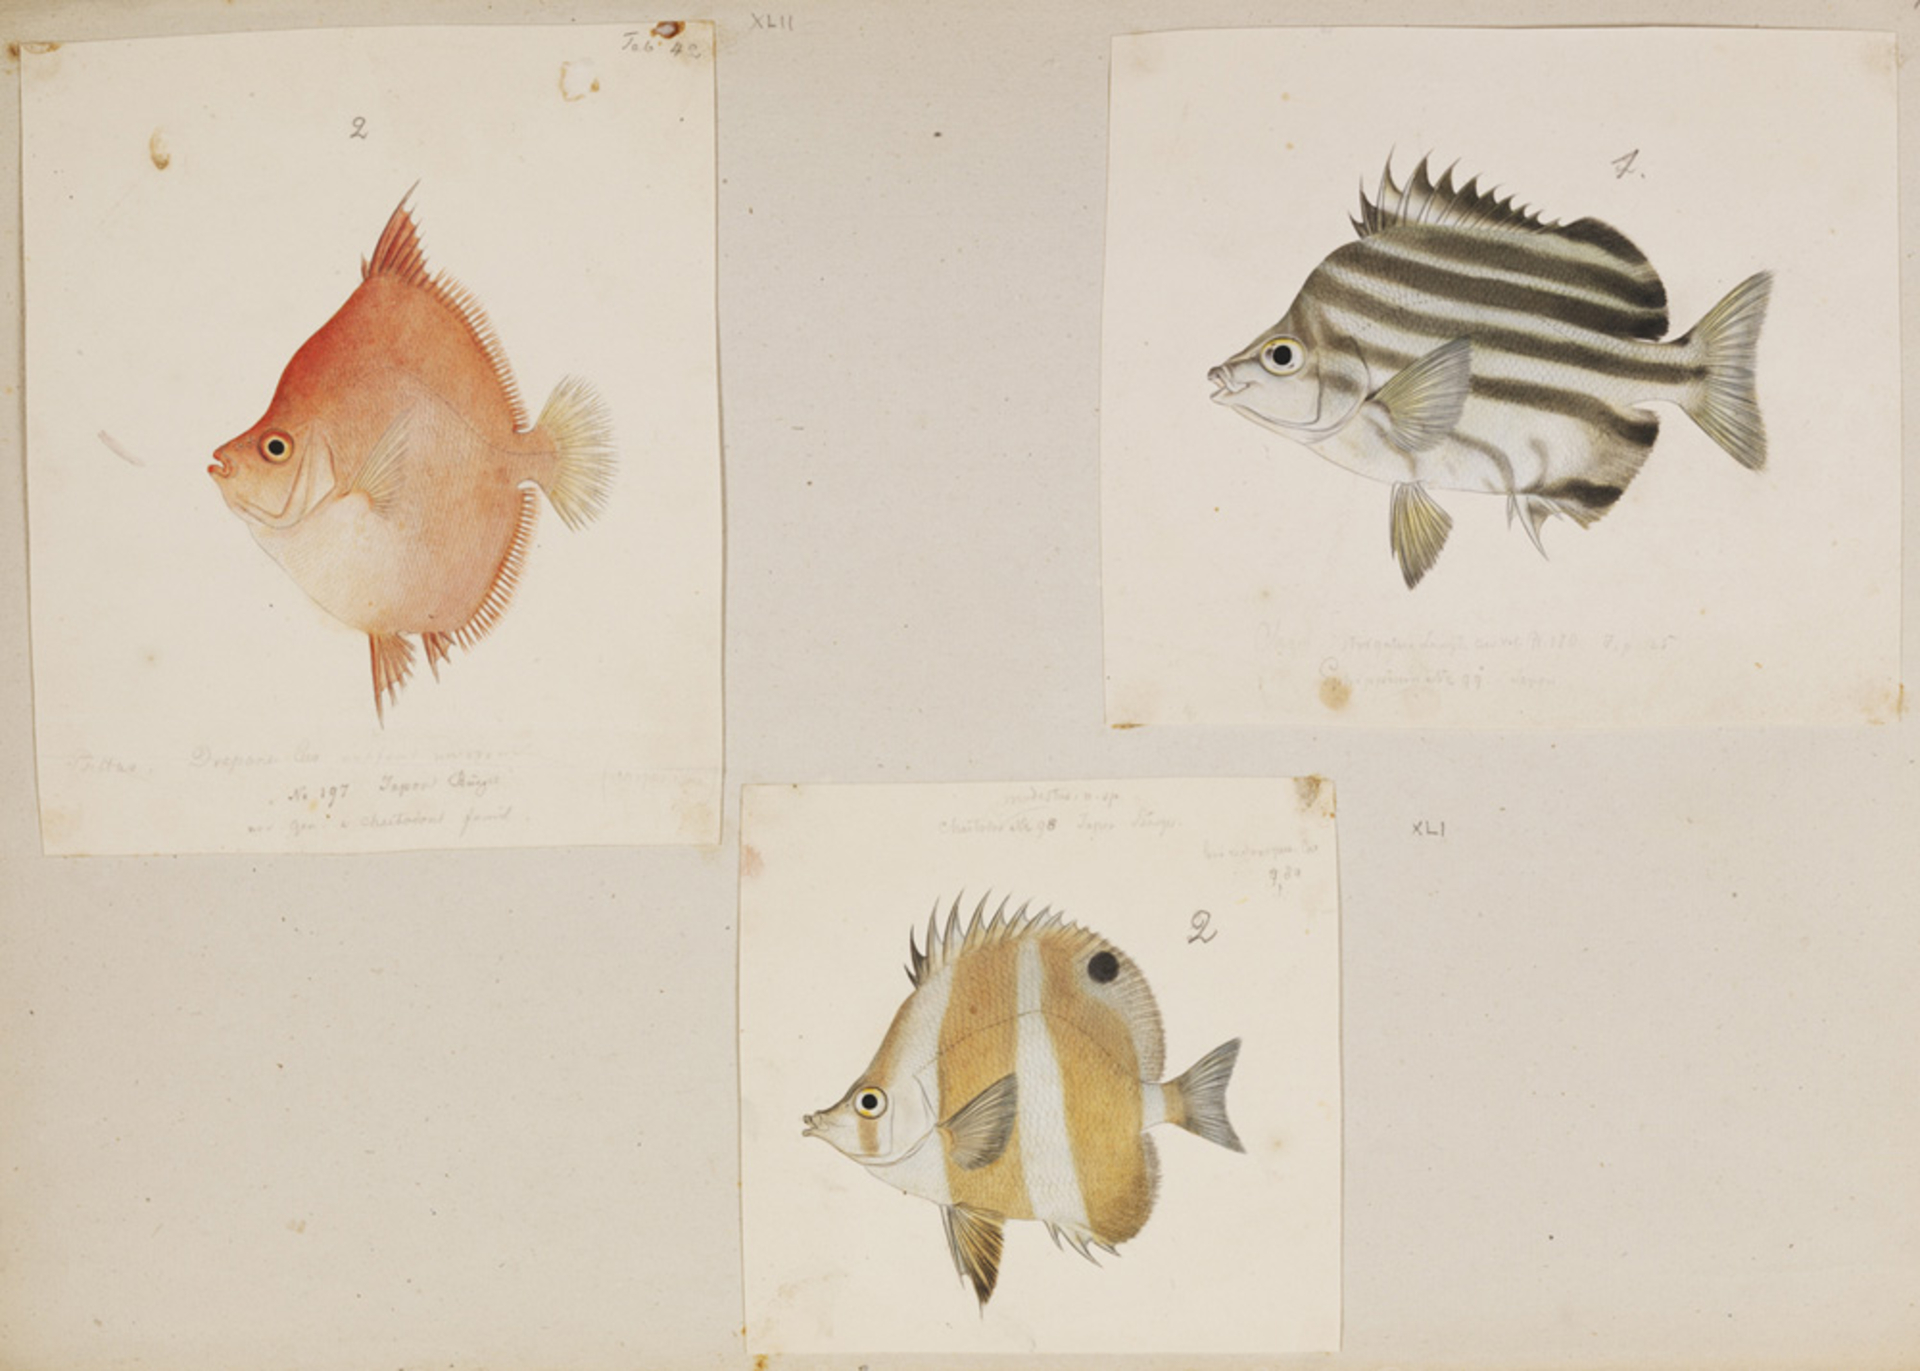 RMNH.ART.207 | Chaetodon modestus